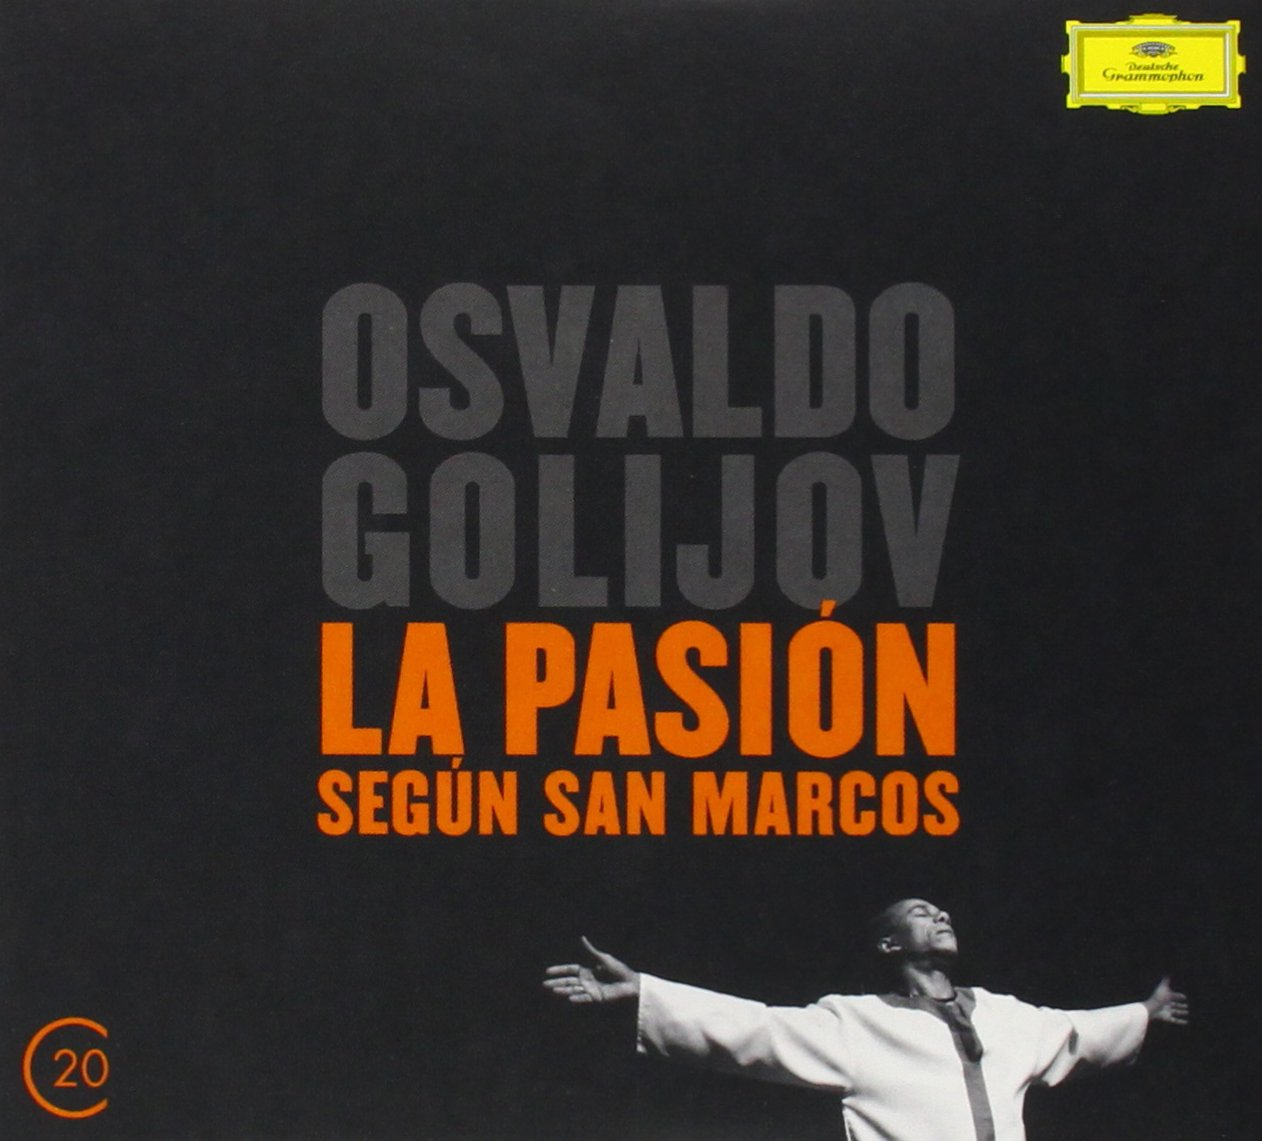 20C: Golijov La Pasion Segun San Marcos (20C) by CD